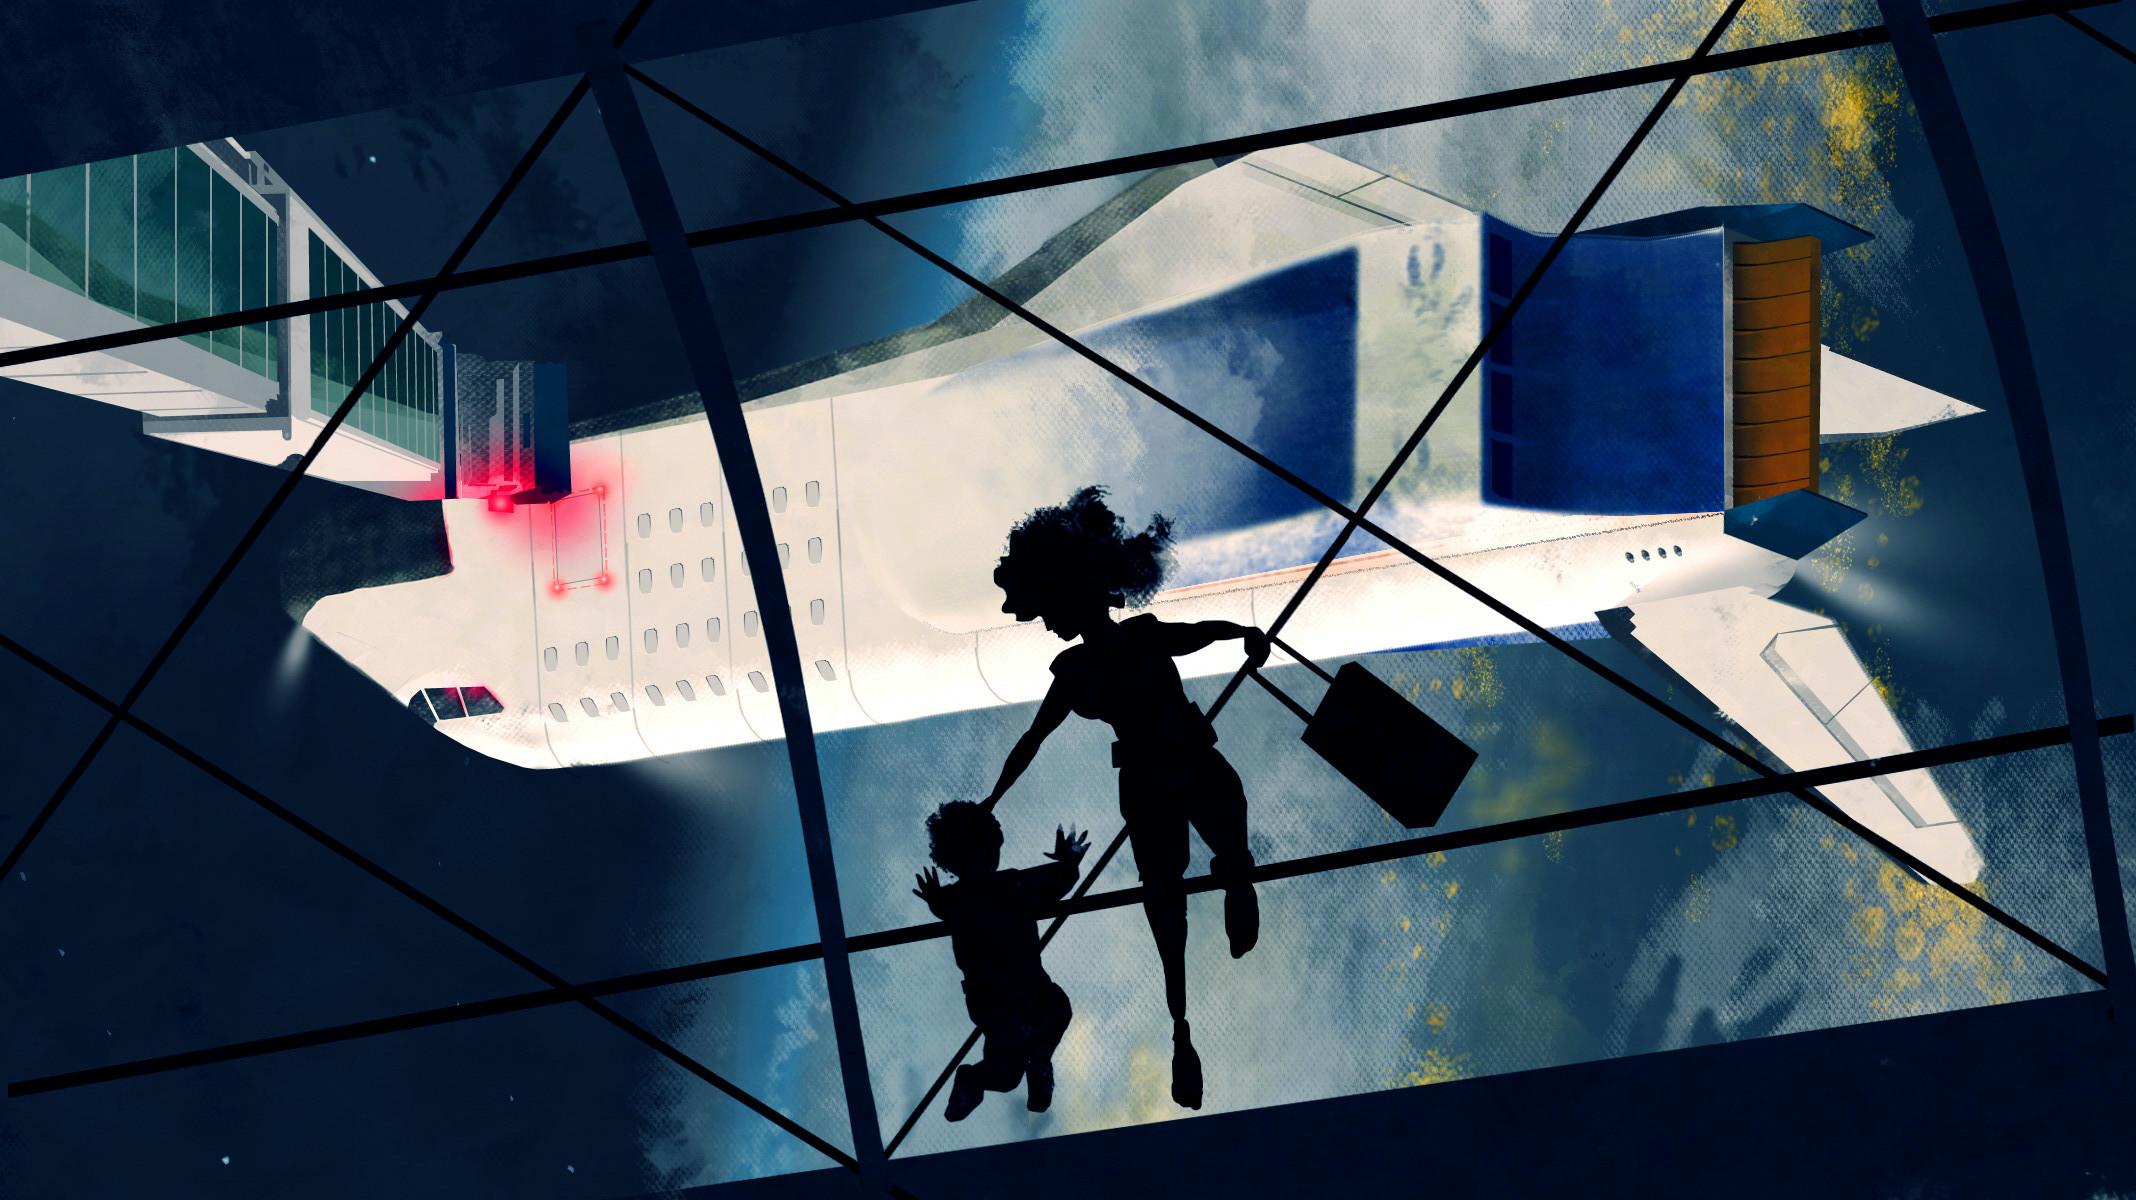 Space Huddle by Matija Tomšić